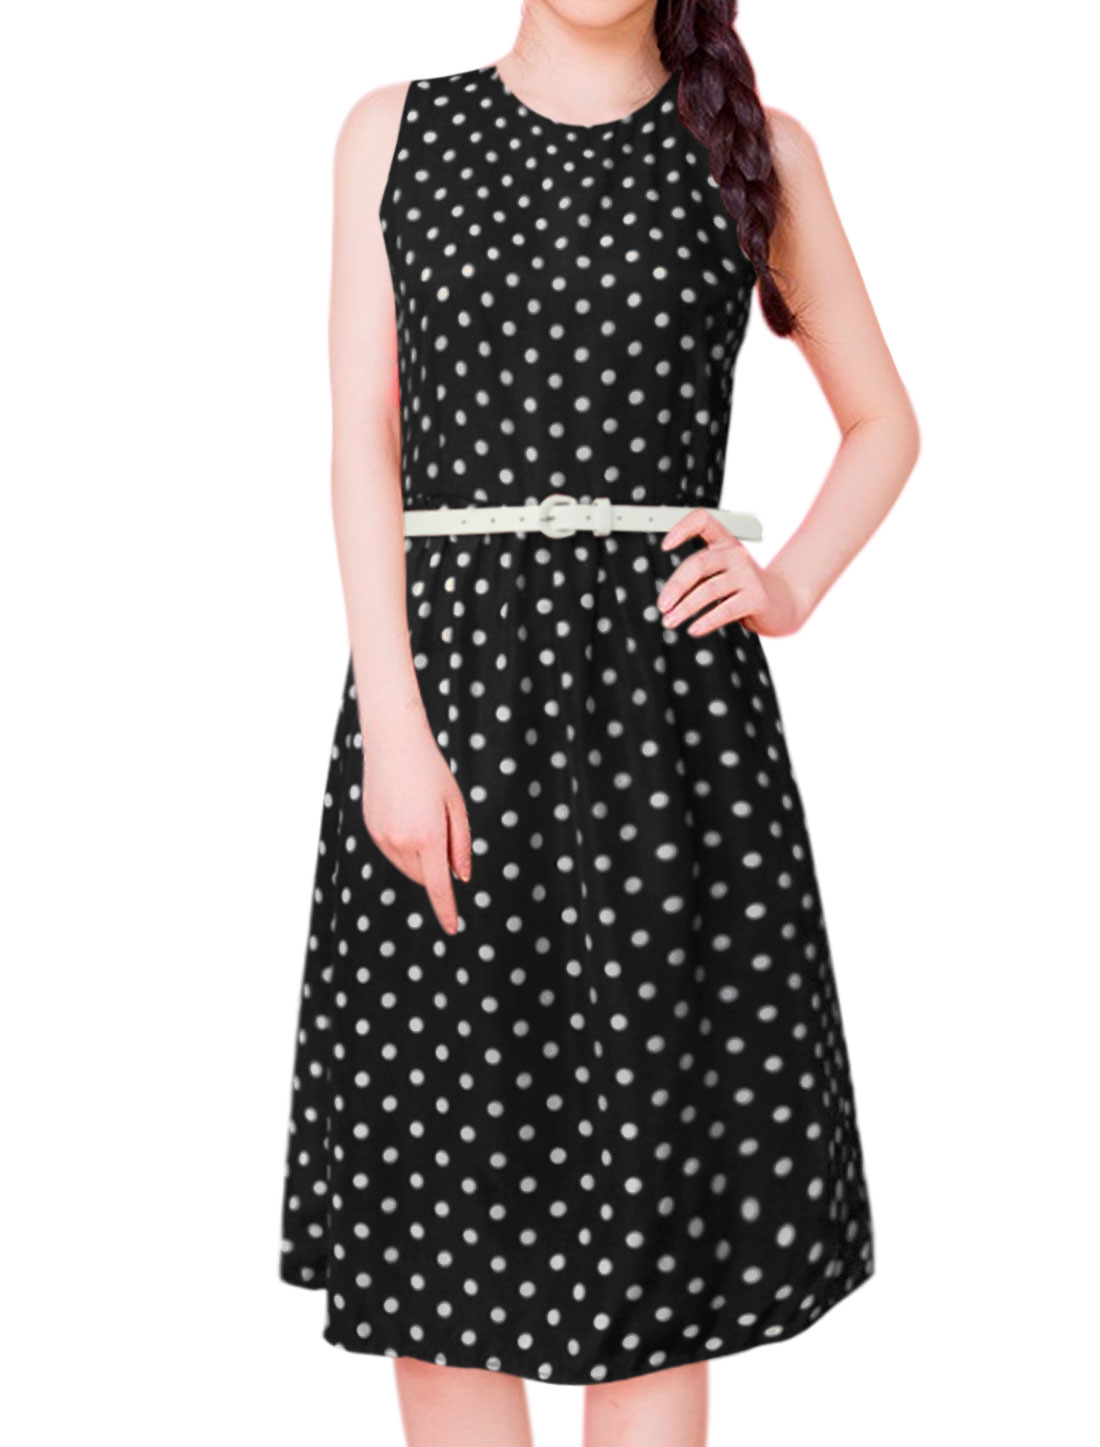 Women Polka Dots Print Sleeveless Belted A Line Dress Black M